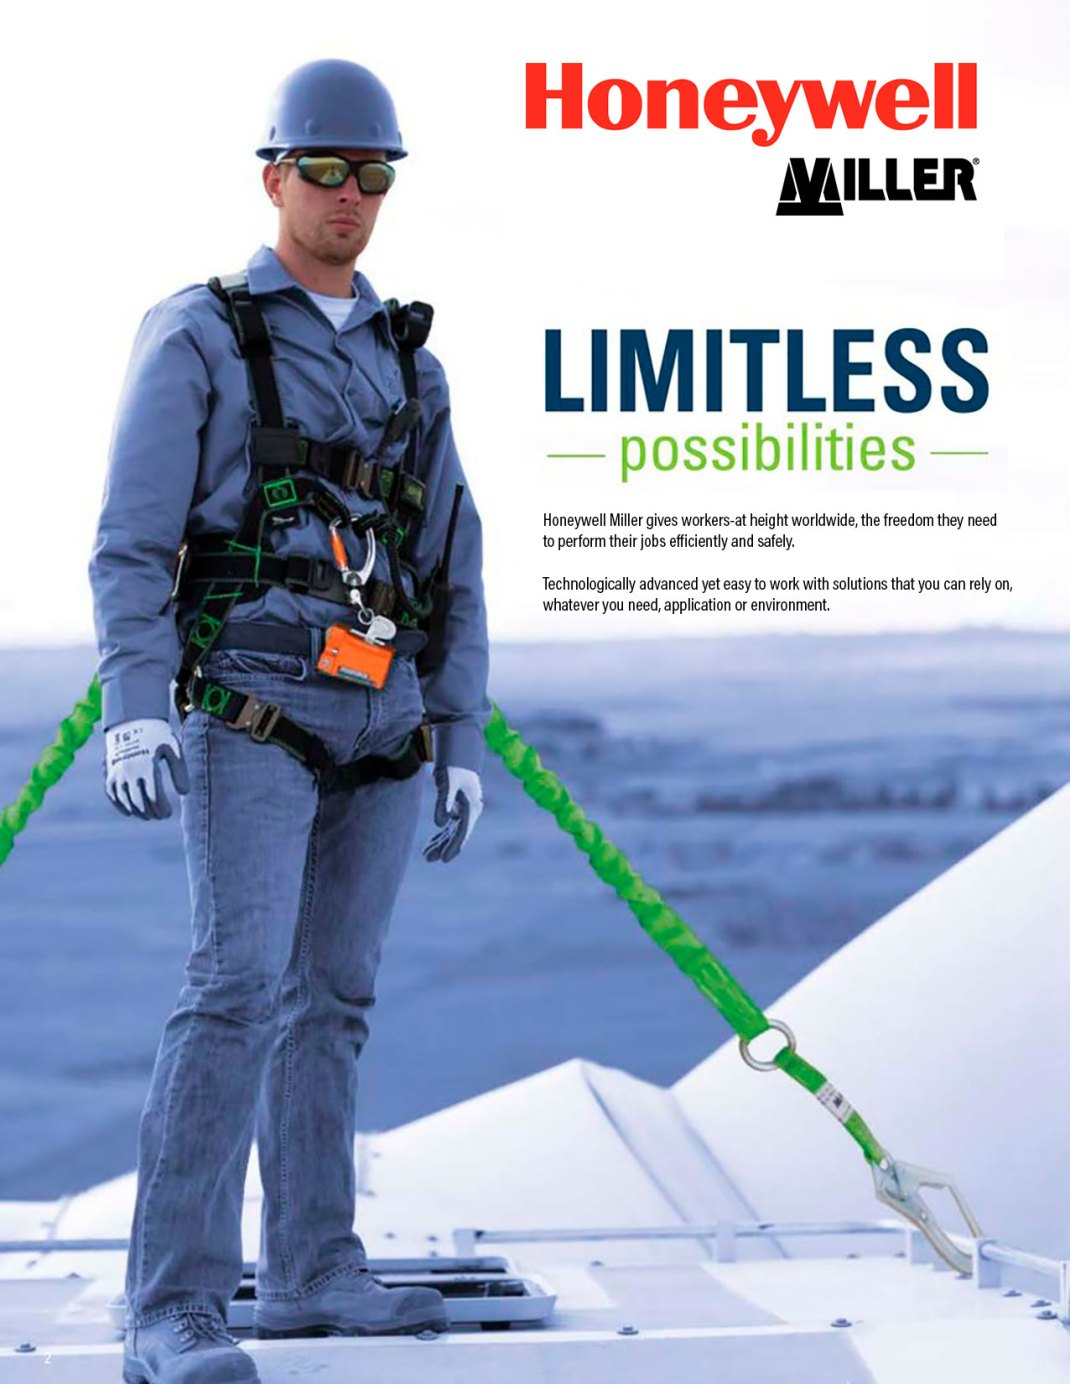 Honeywell Miller